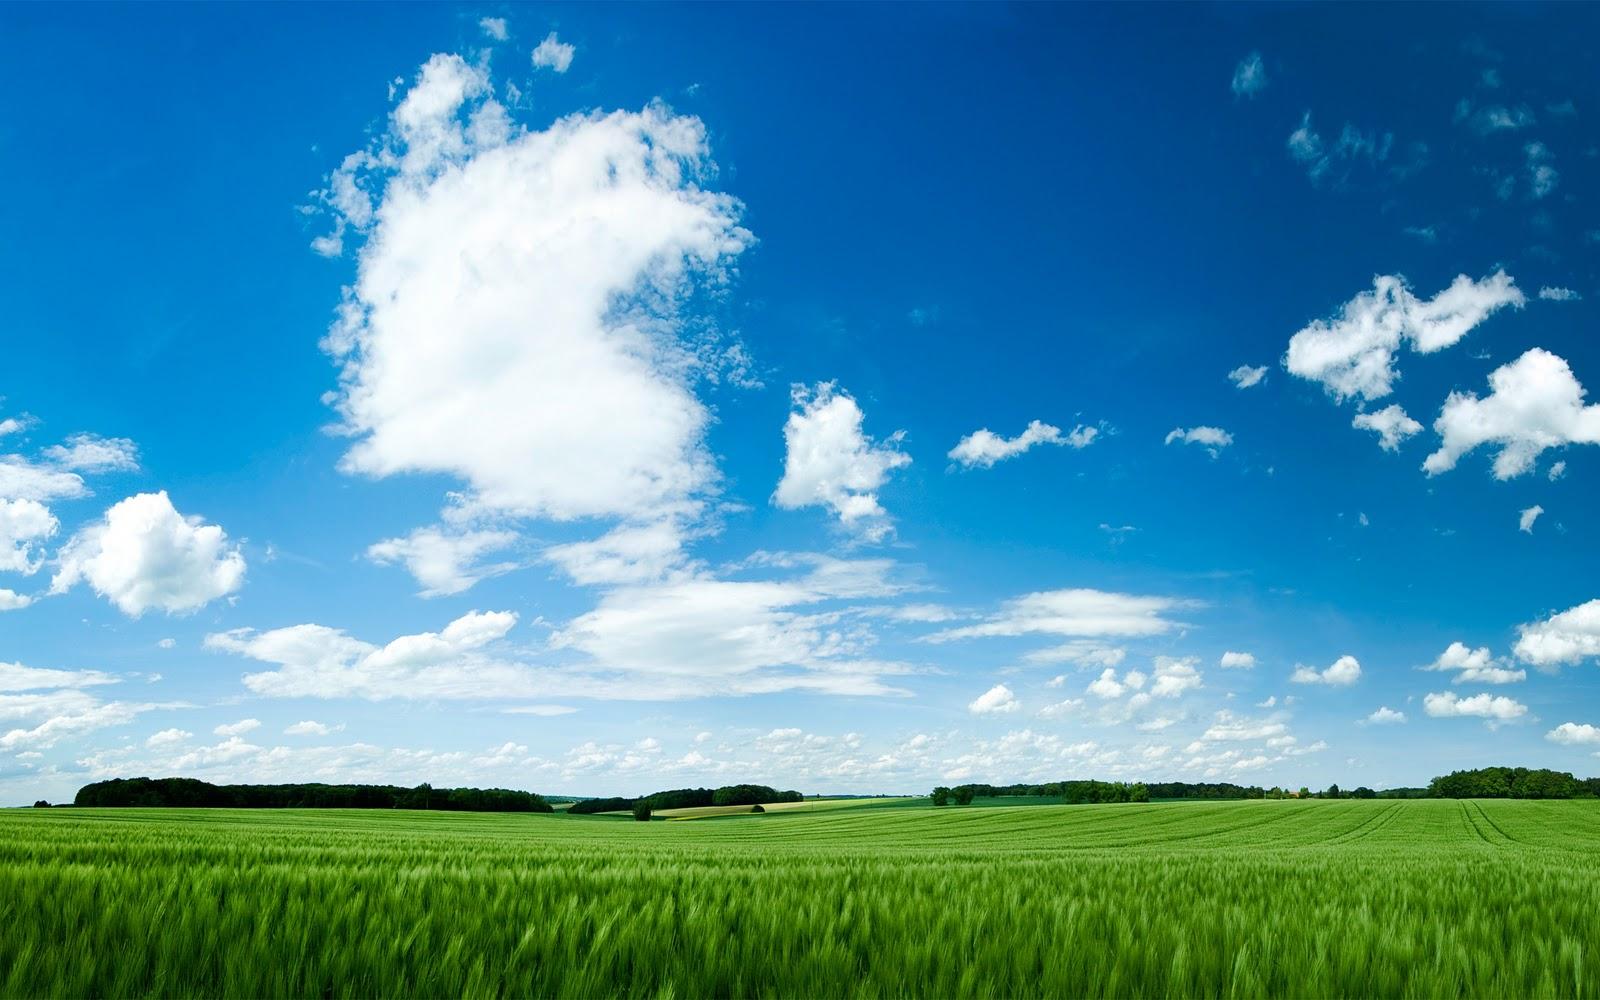 Field Peaceful Landscape HD Wallpapers Epic Desktop Backgrounds 1600x1000